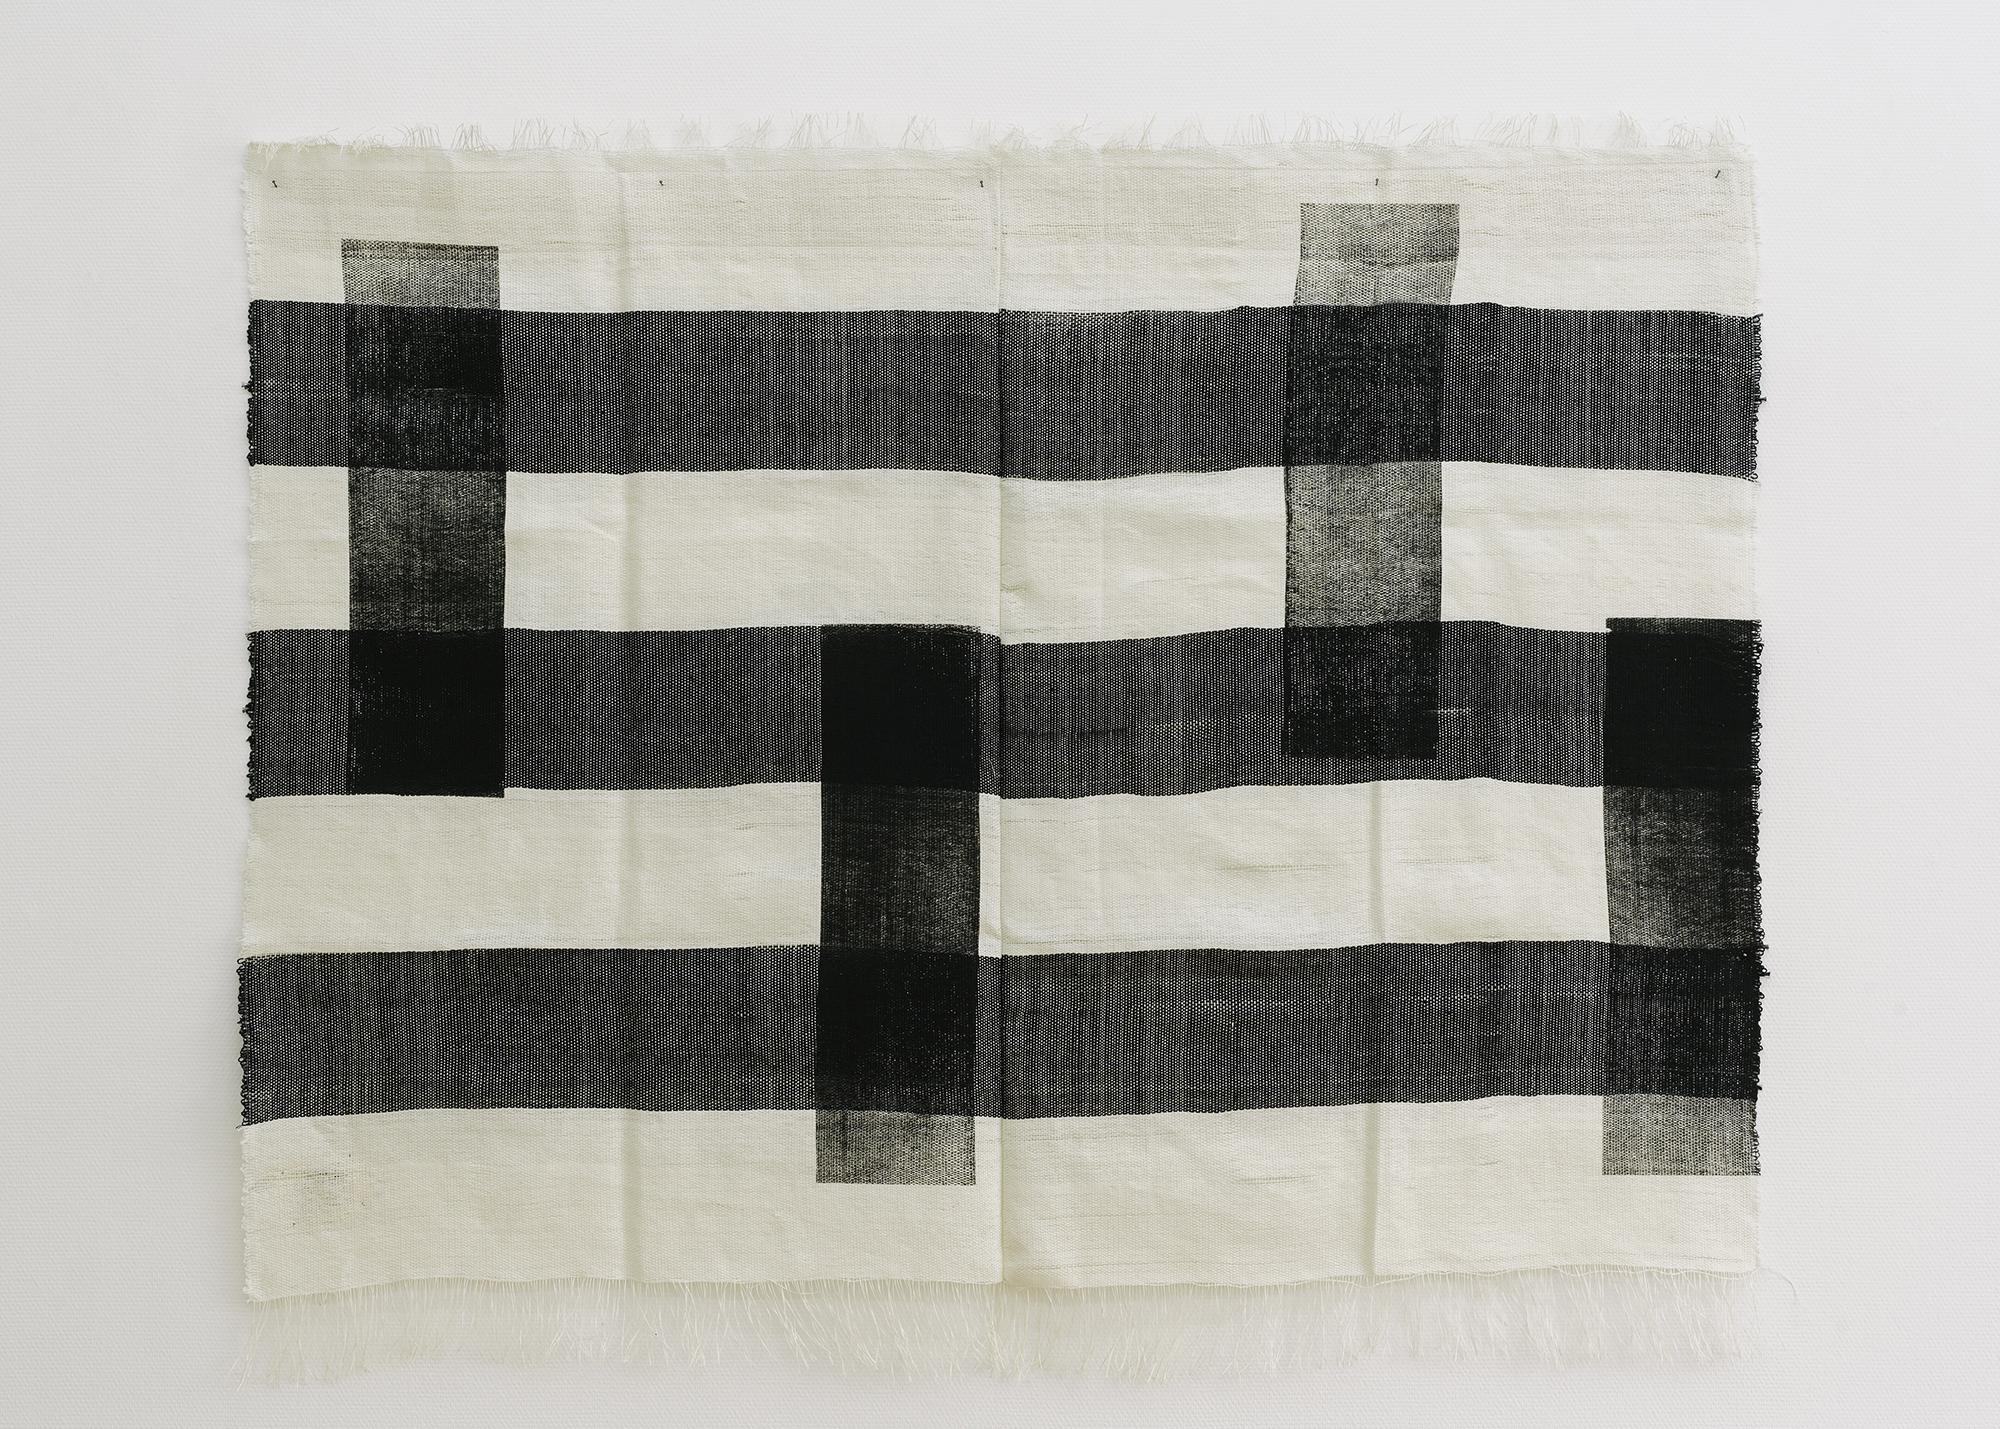 1 Marie Hazard _«réveilles toi»_Hand woven in paper linen and screenprinting_2020_160x200cm